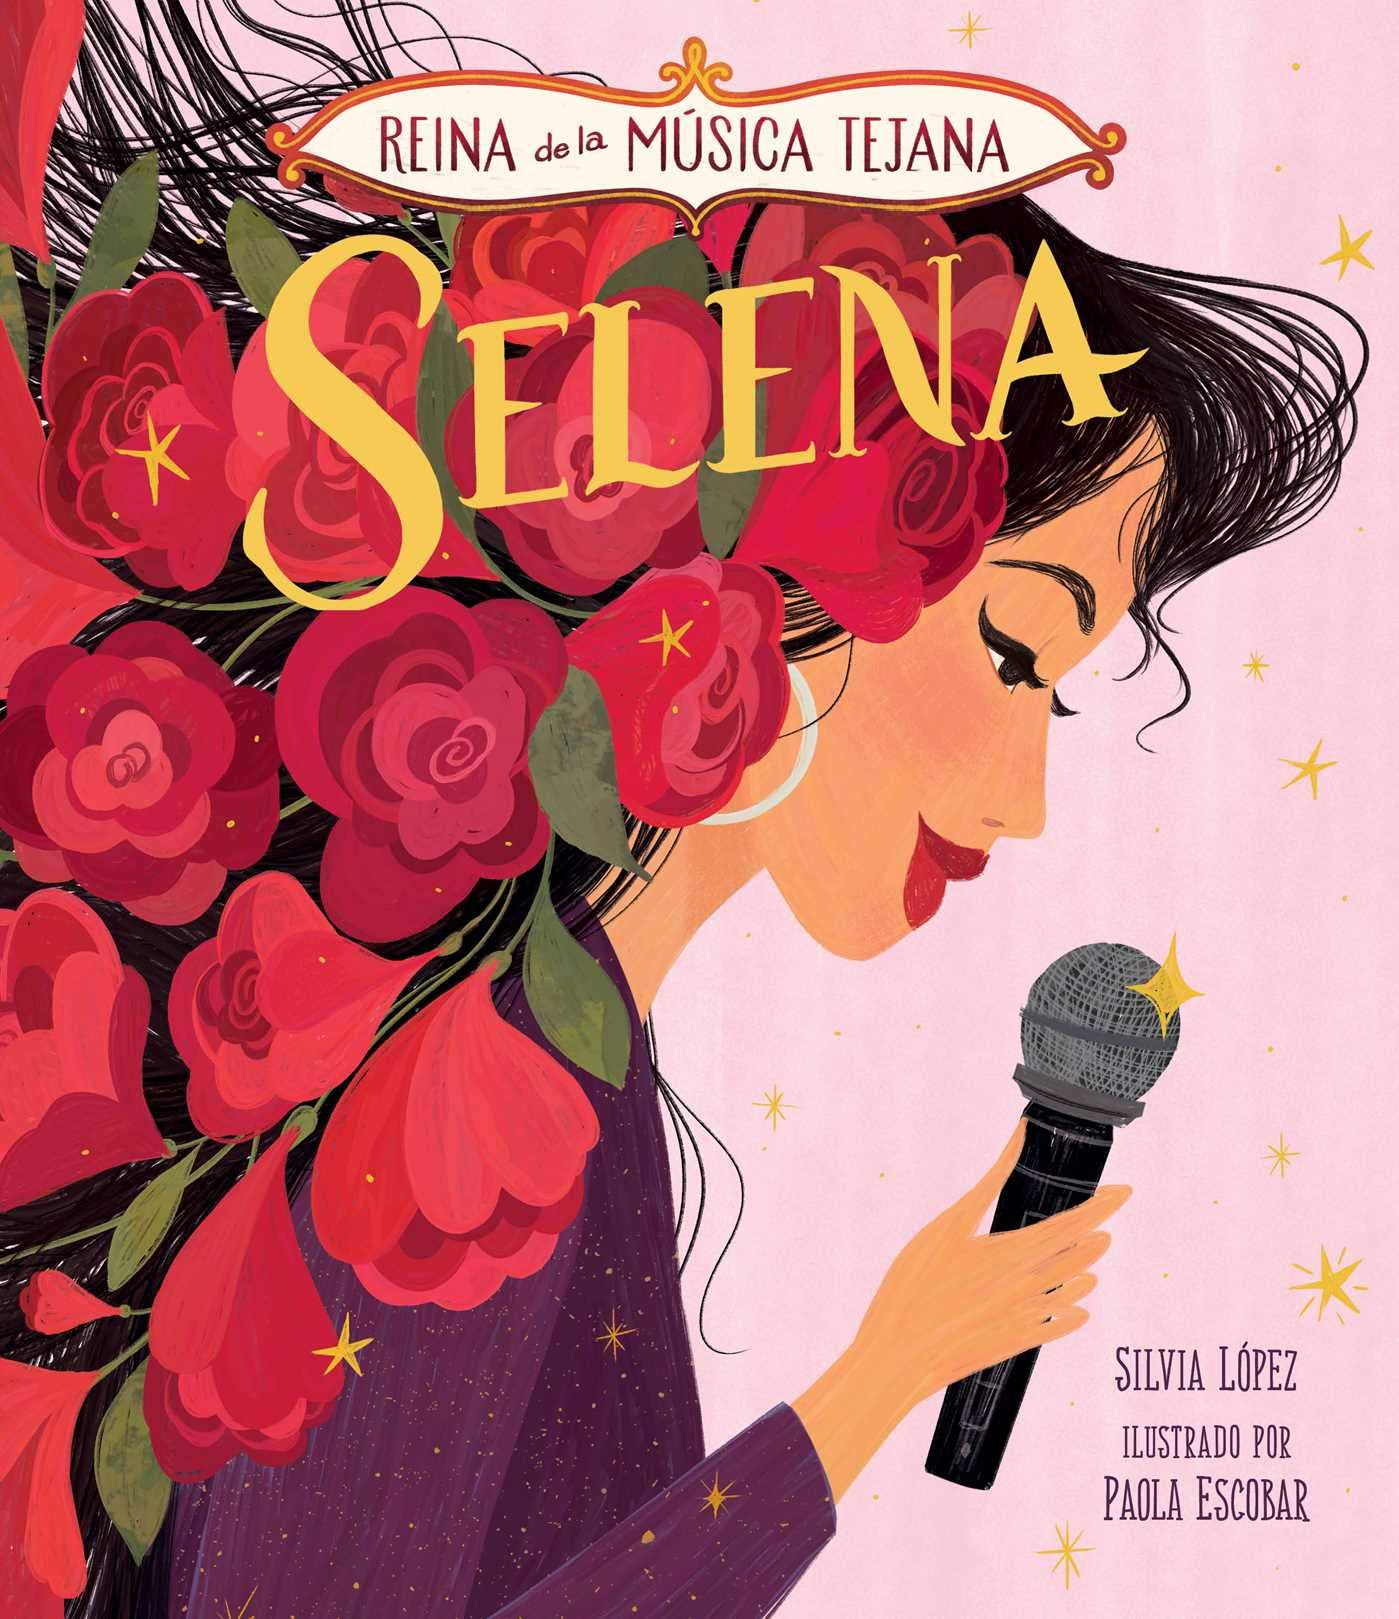 Amazon.com: Selena, reina de la música tejana (9781499811438): López, Silvia,  Escobar, Paola: Books